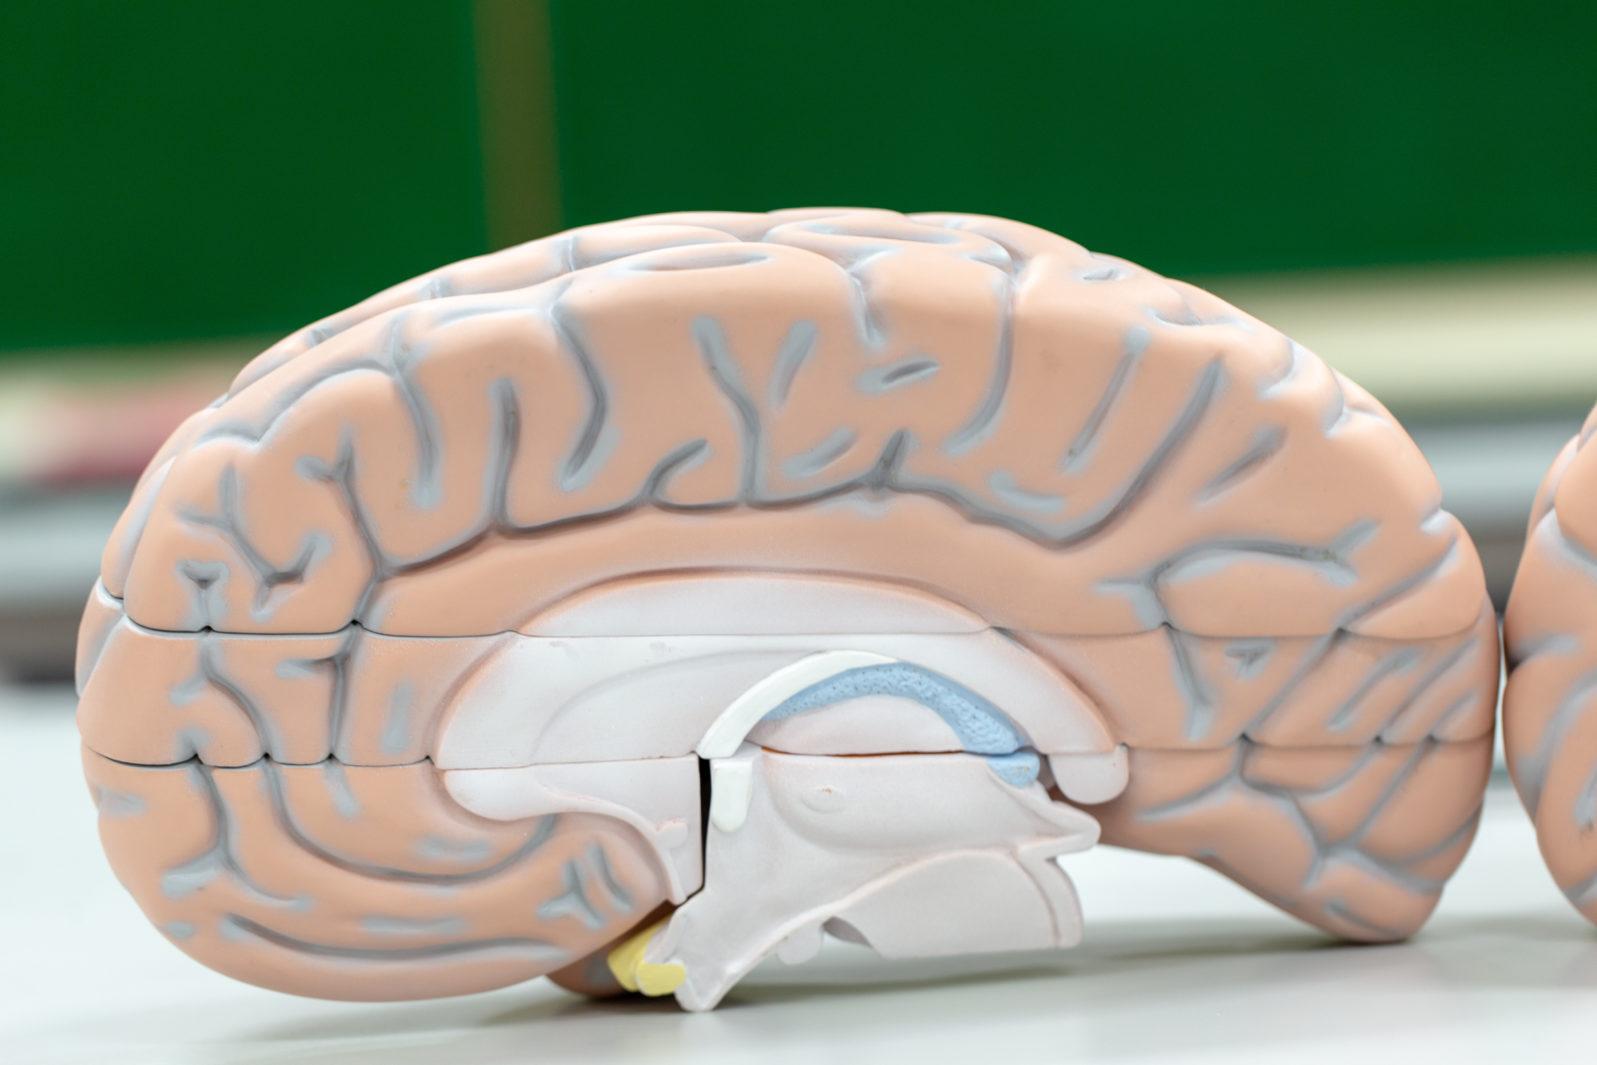 Human brain model for education in laboratory.